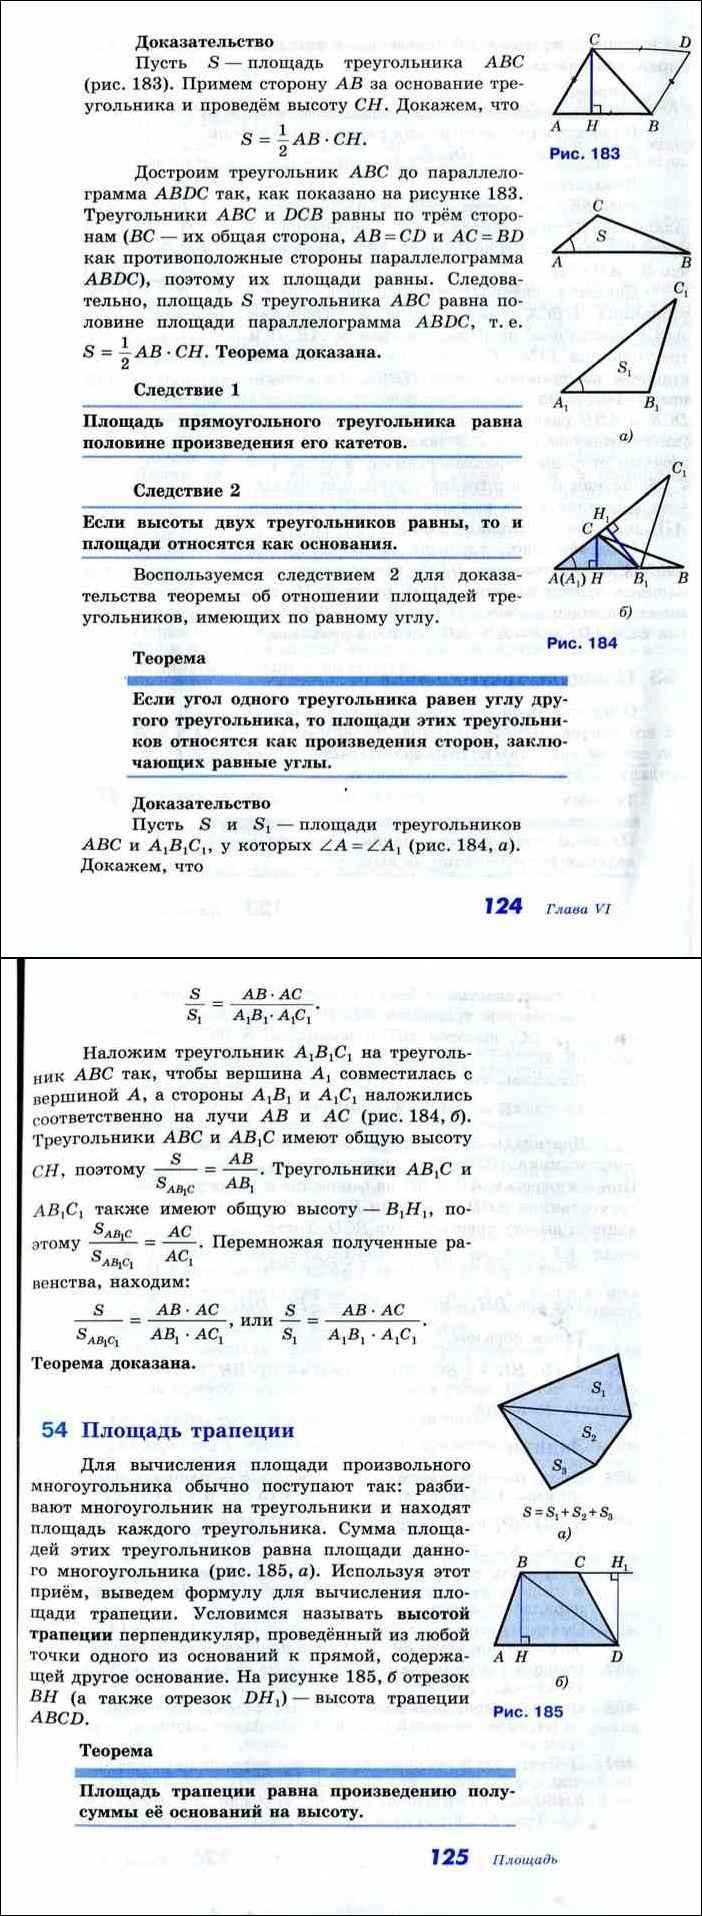 Учебник геометрия 7 9 класс атанасян читать онлайн бесплатно.